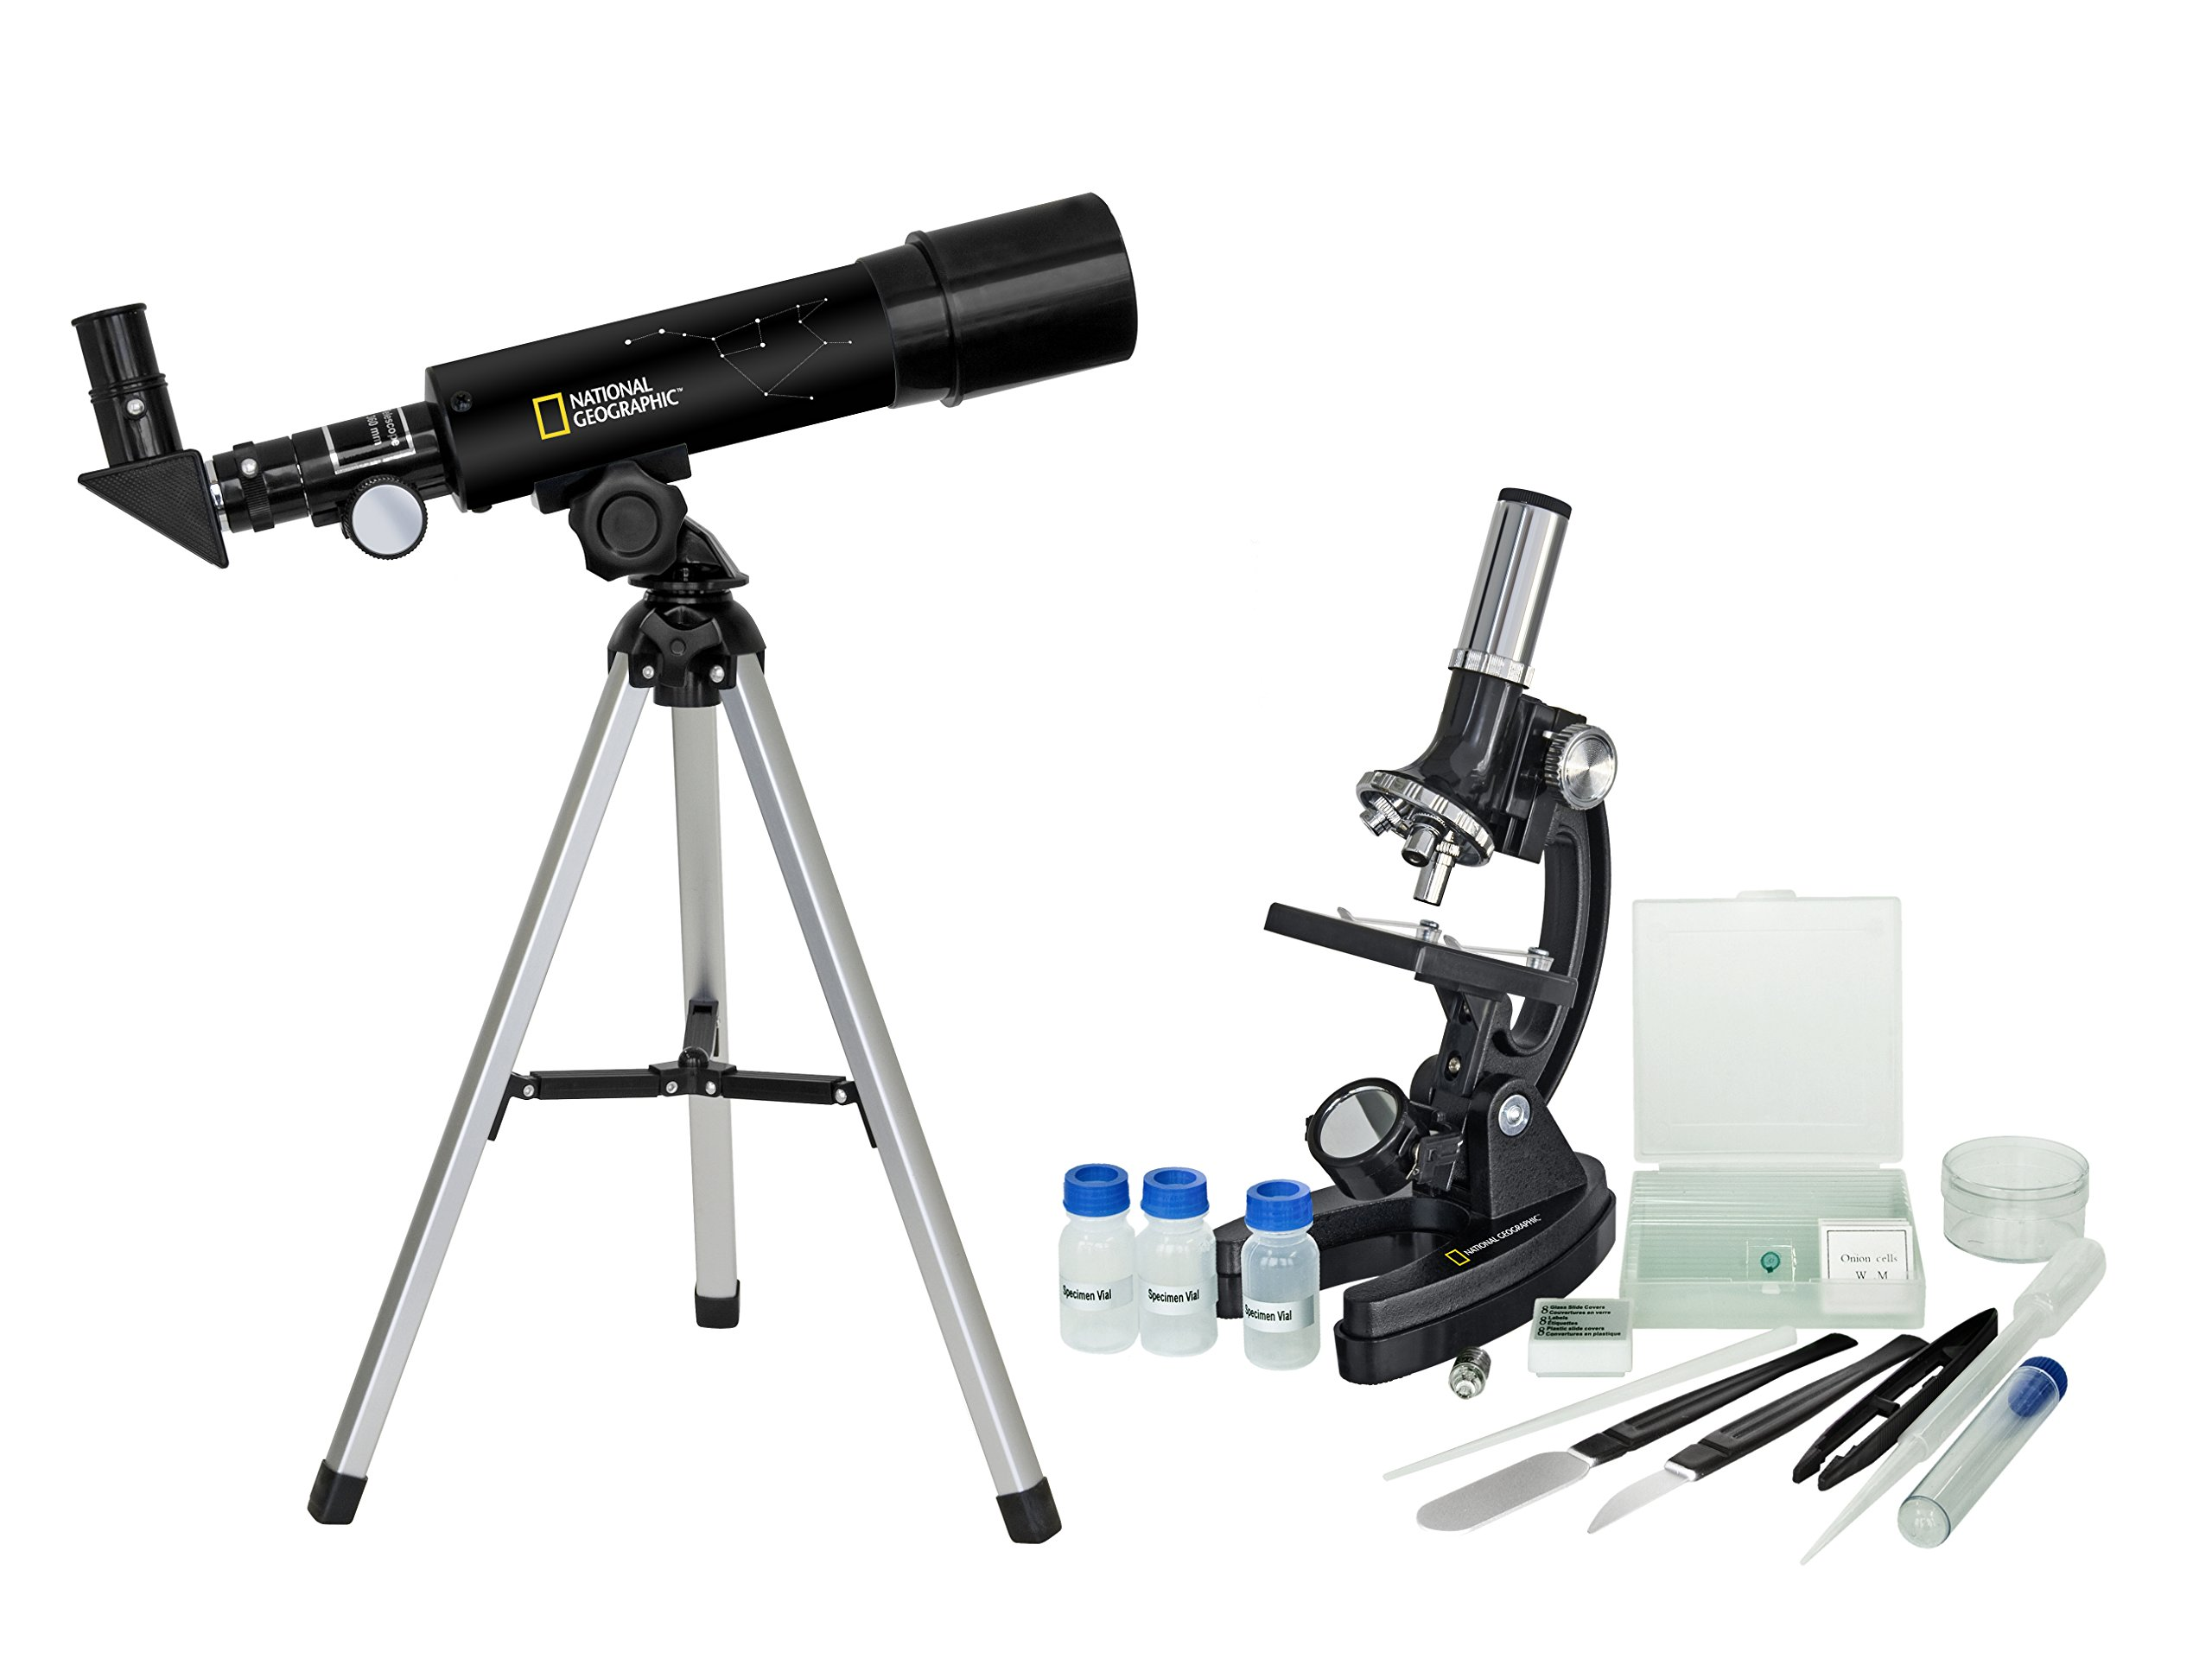 National Geographic Set (Telescope/Microscope), 9118000 (/ Microscope))